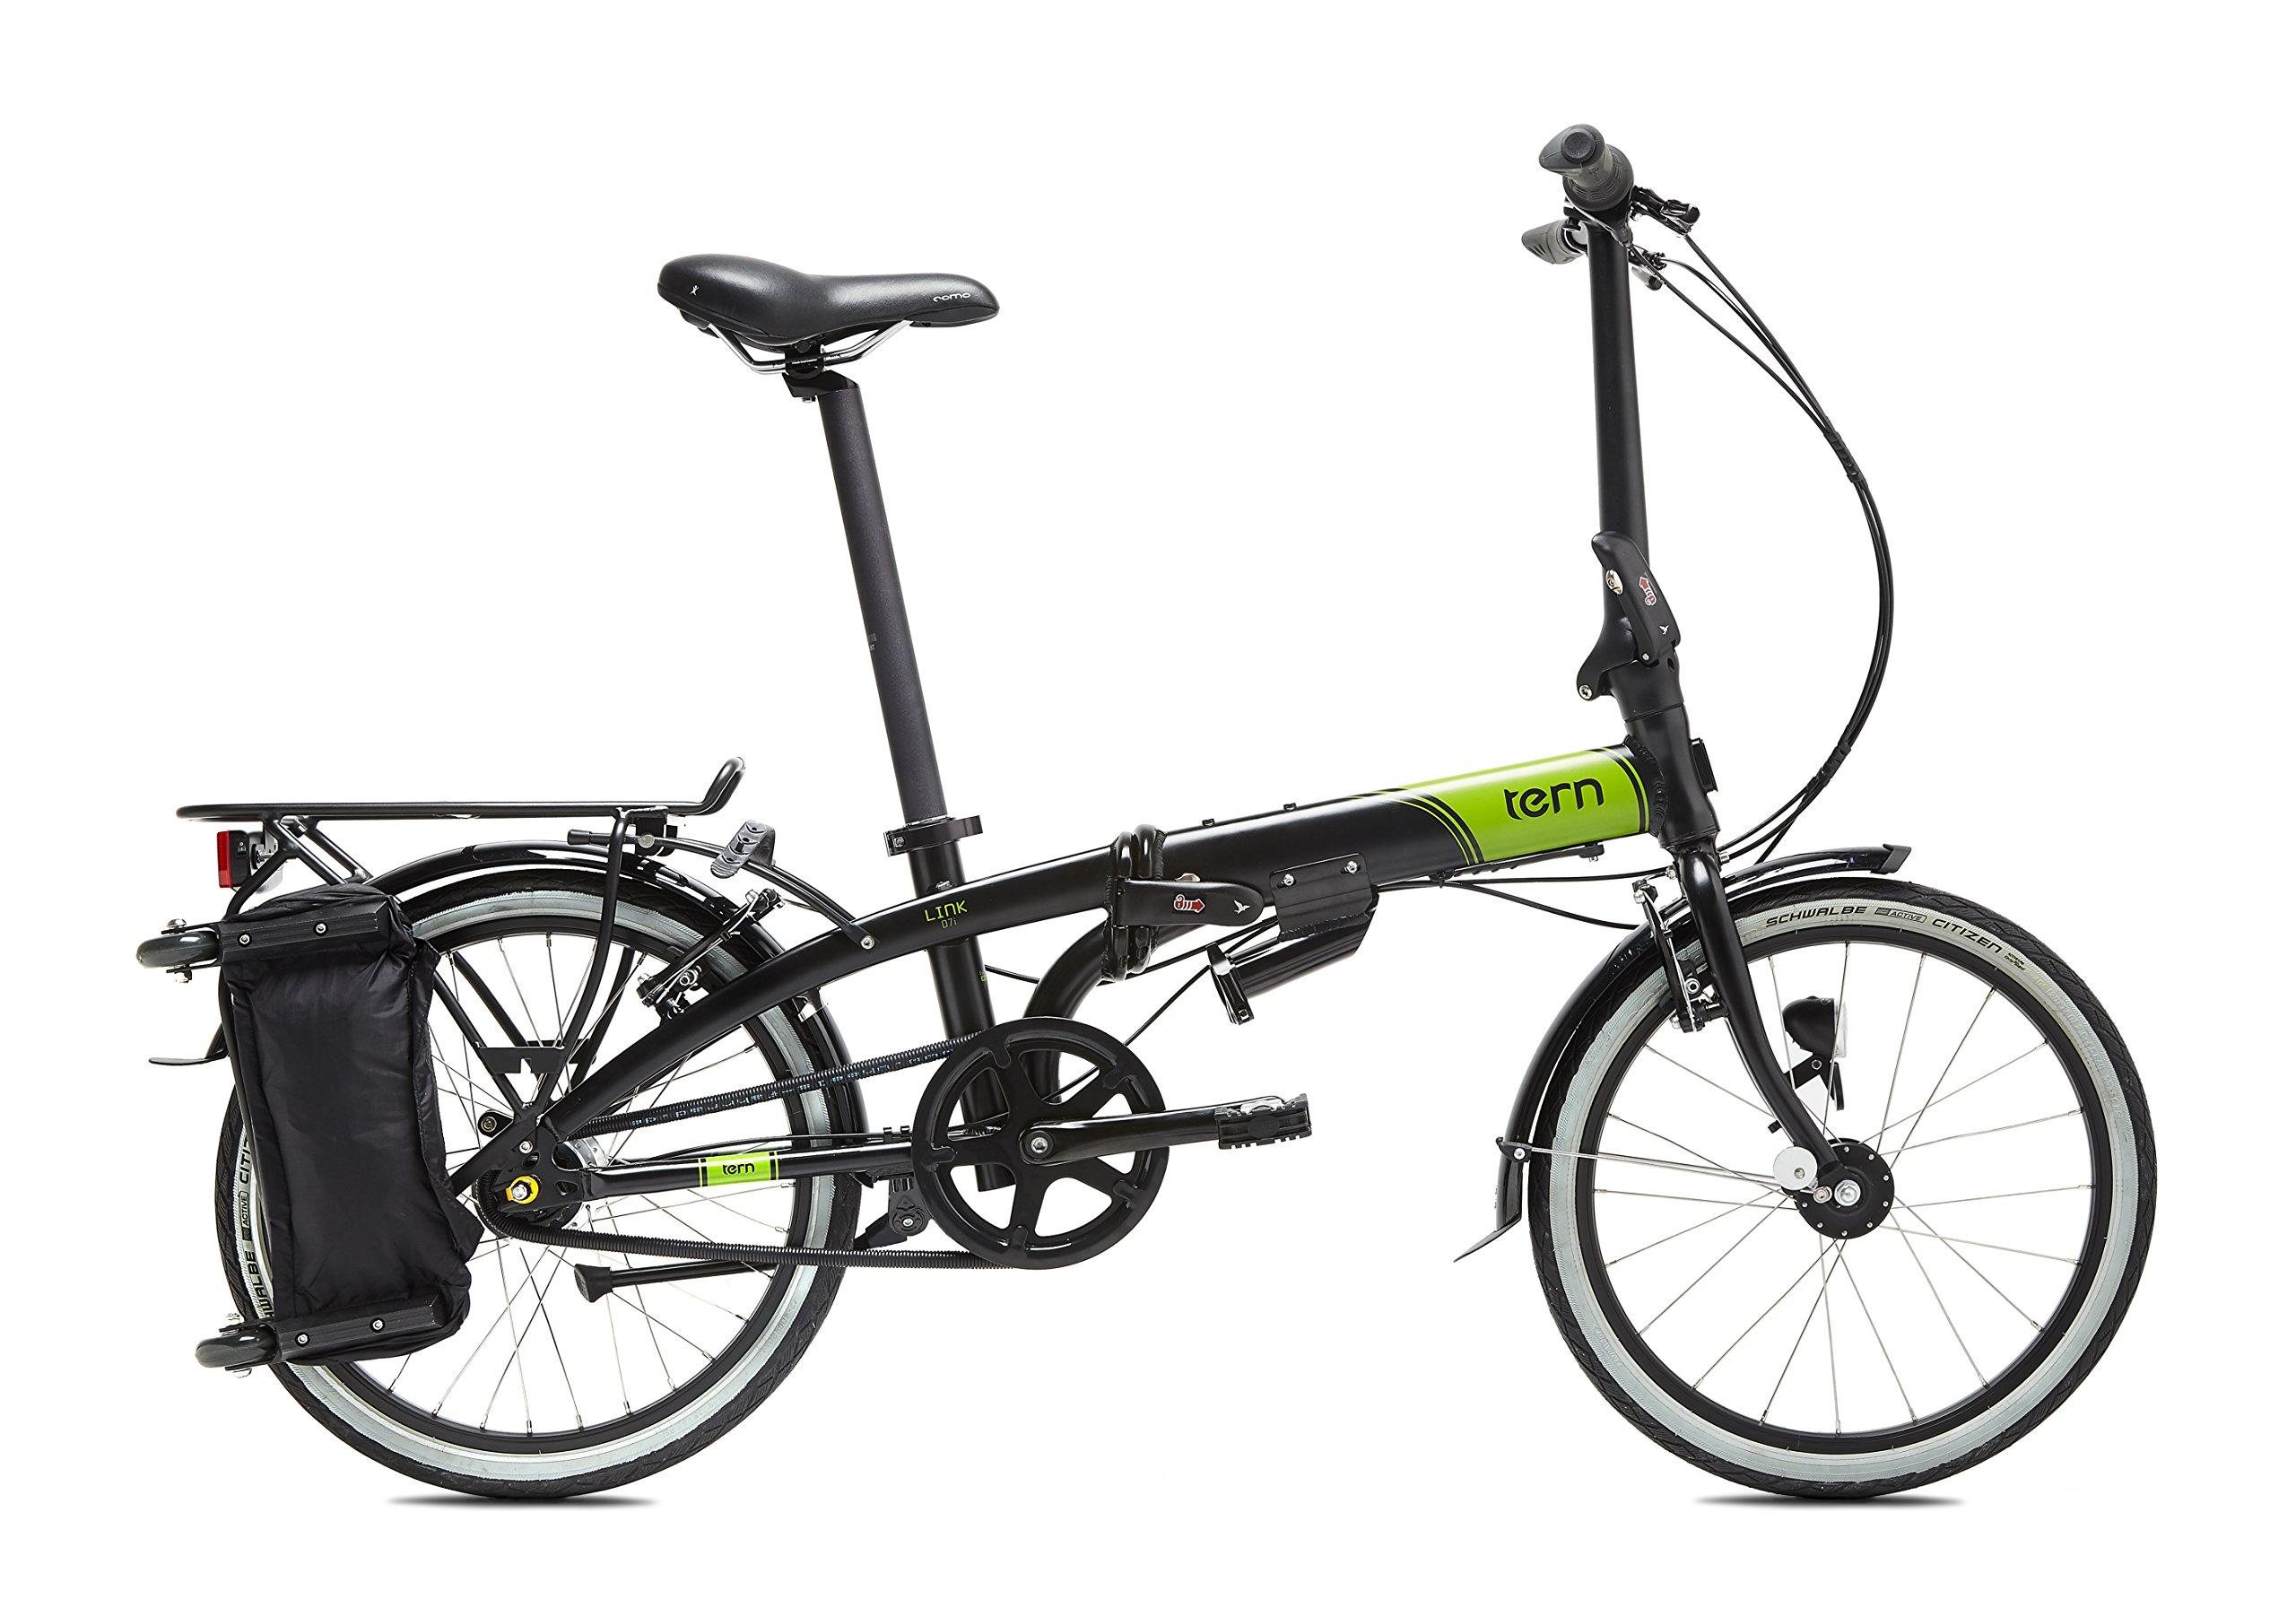 Tern Link D7i Bicicleta, Unisex Adulto, Negro, Talla Única: Amazon ...